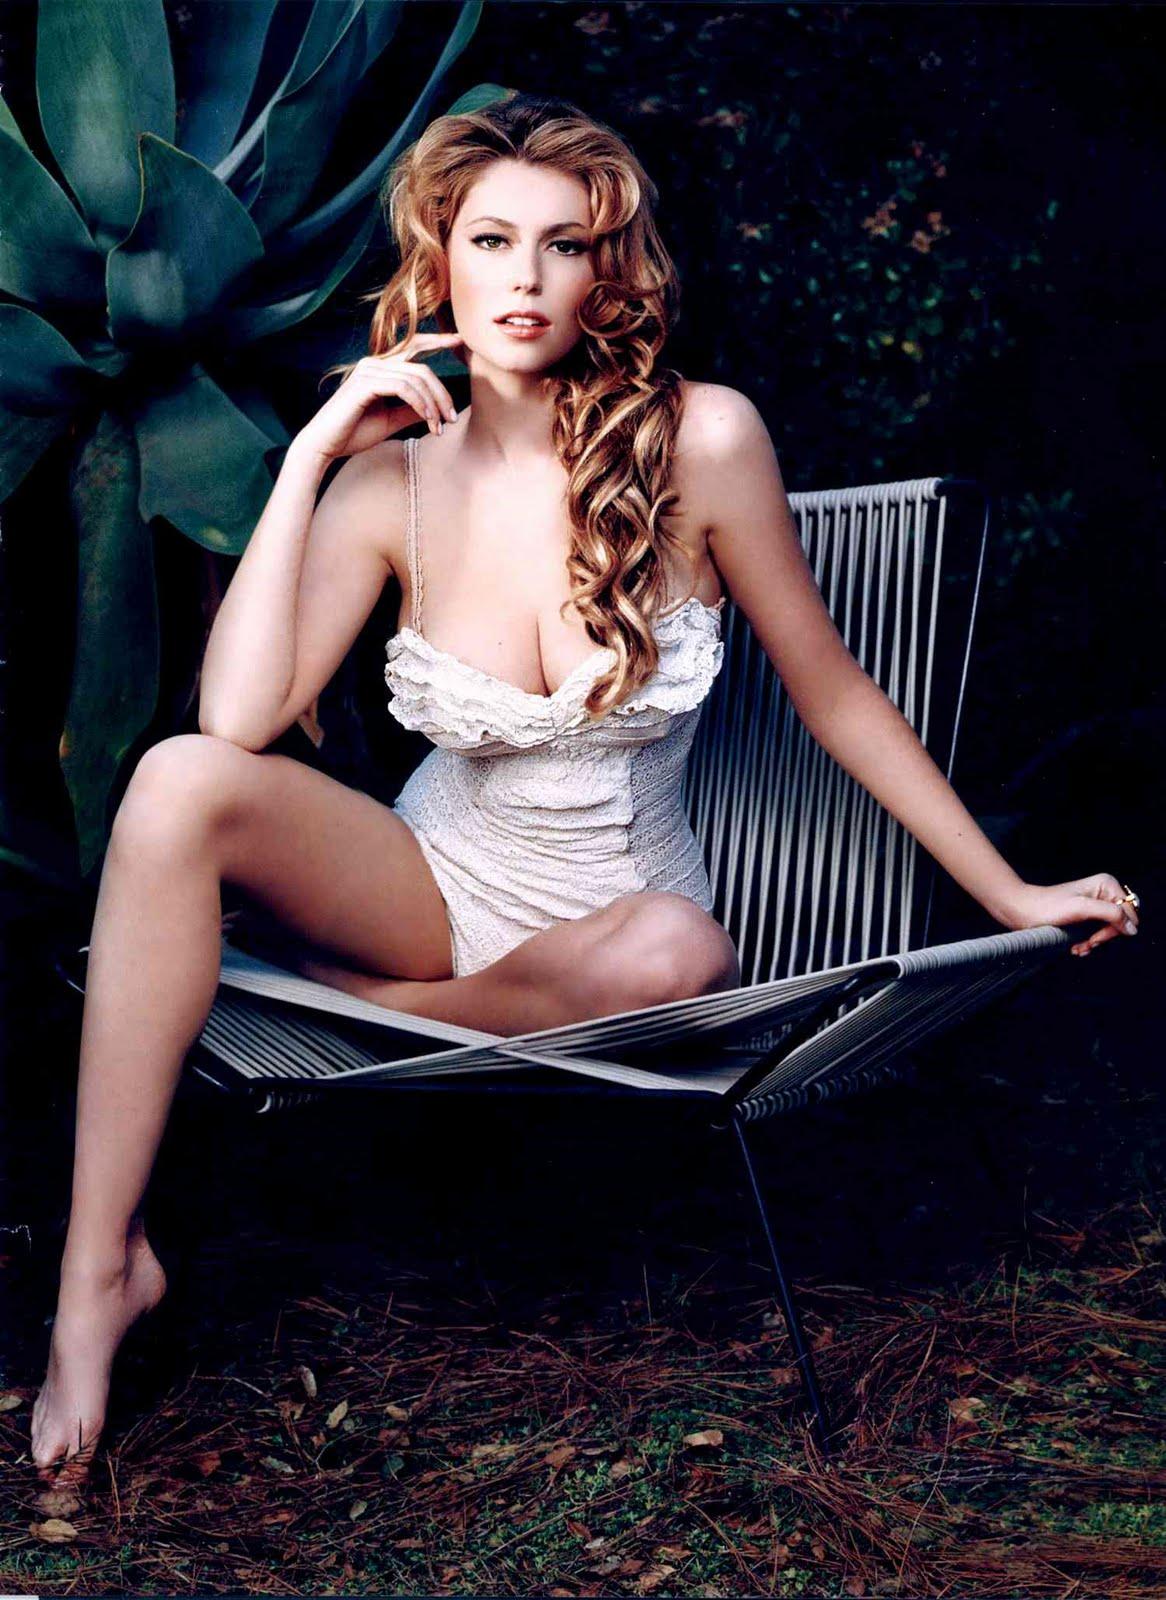 Sexy Actress Soles Diora Baird Feet And Soles